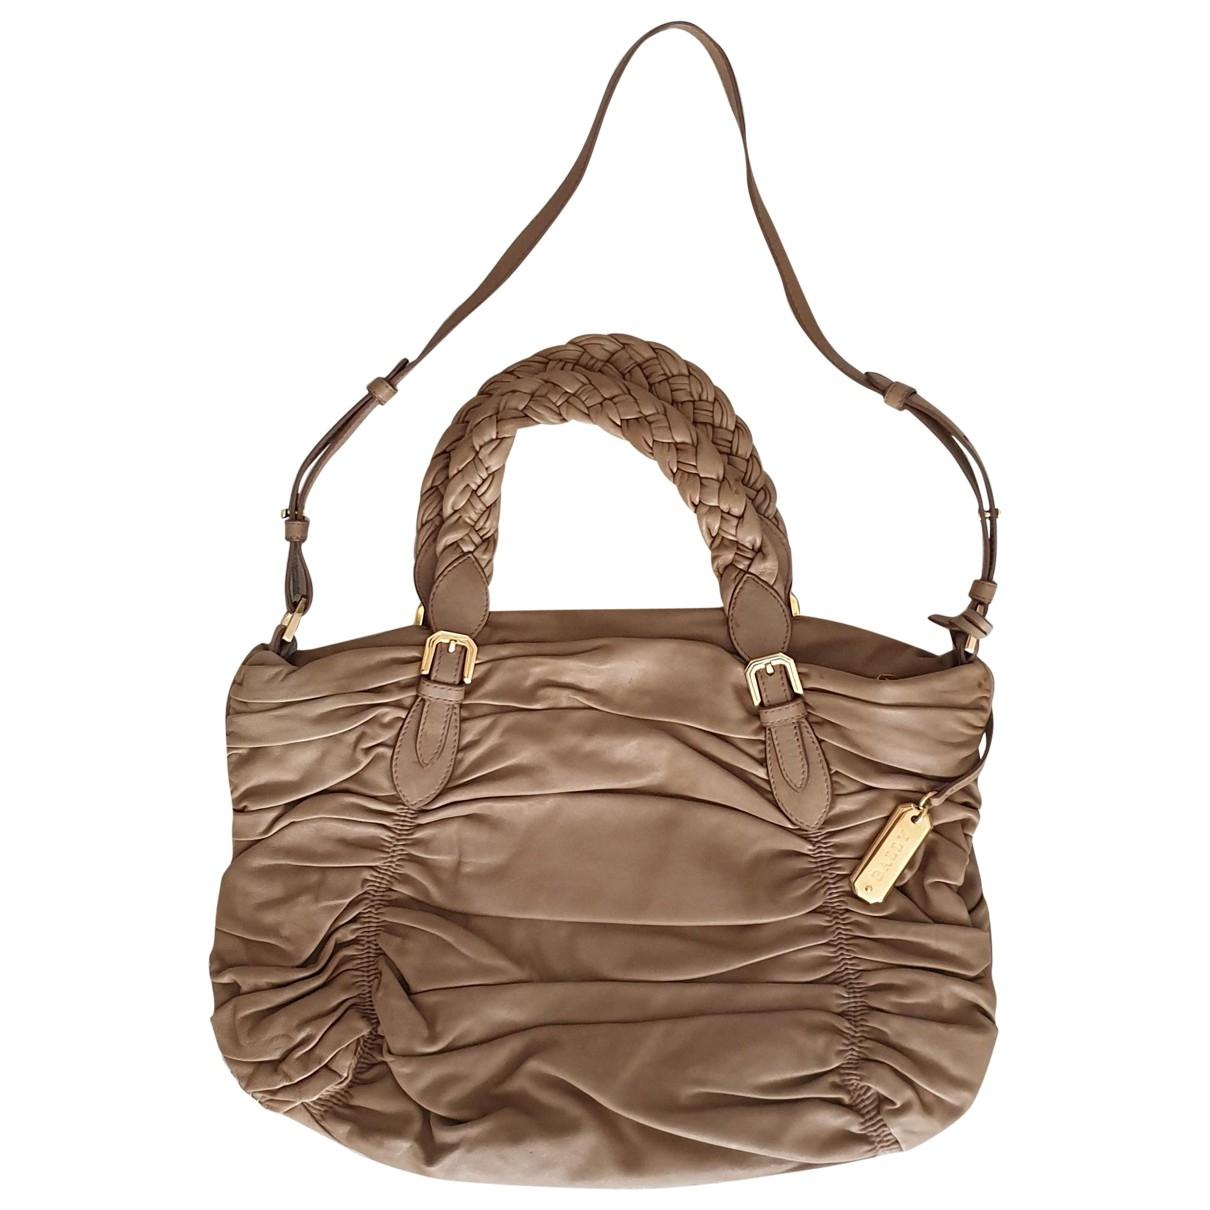 Bally \N Camel Leather handbag for Women \N